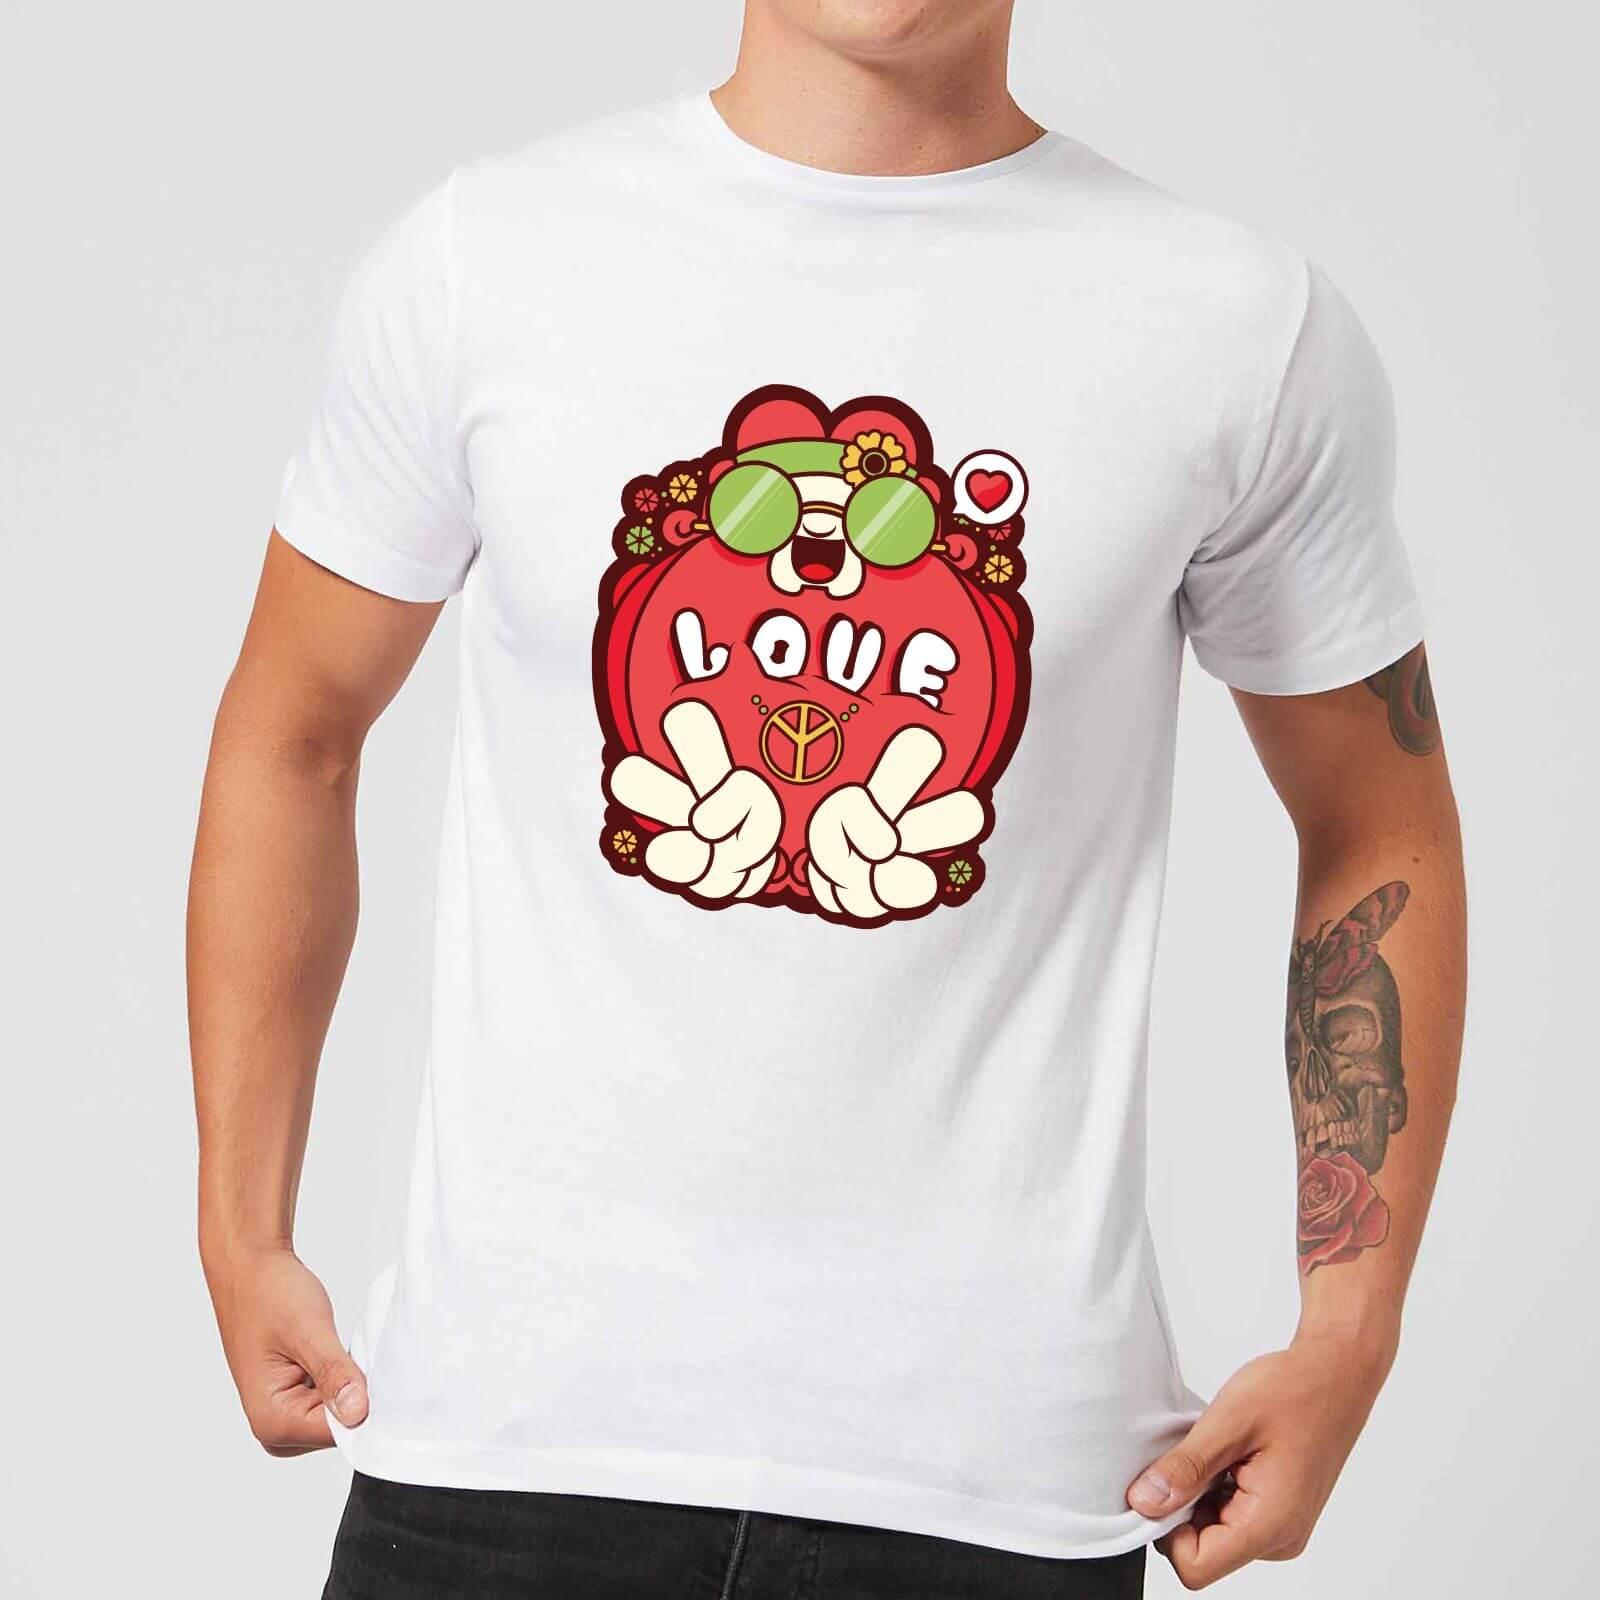 IWOOT Hippie Love Cartoon Men's T-Shirt - White - XL - White-male